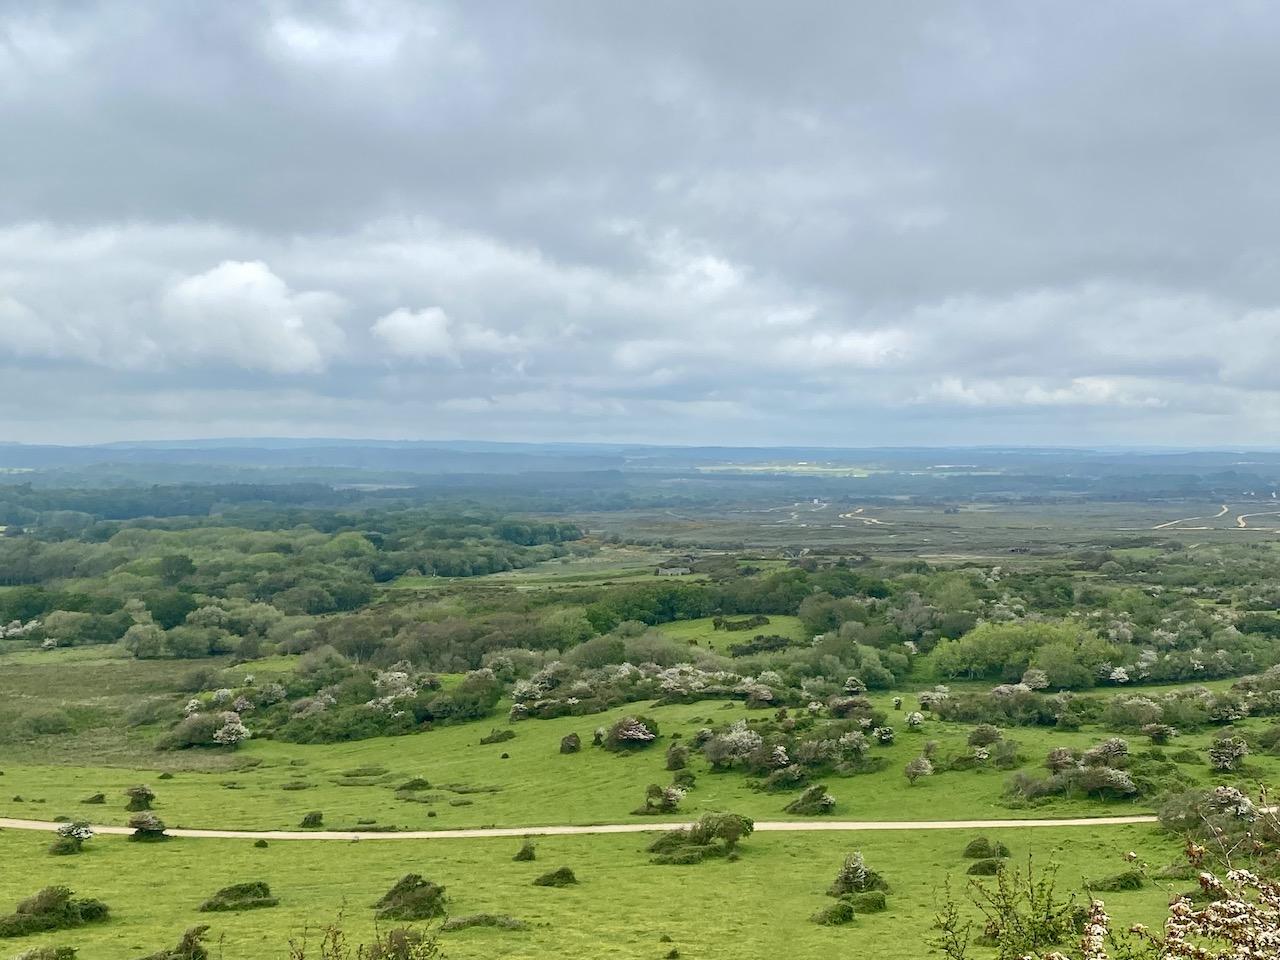 Road Trip to the Jurassic Coast - Dorset landscape